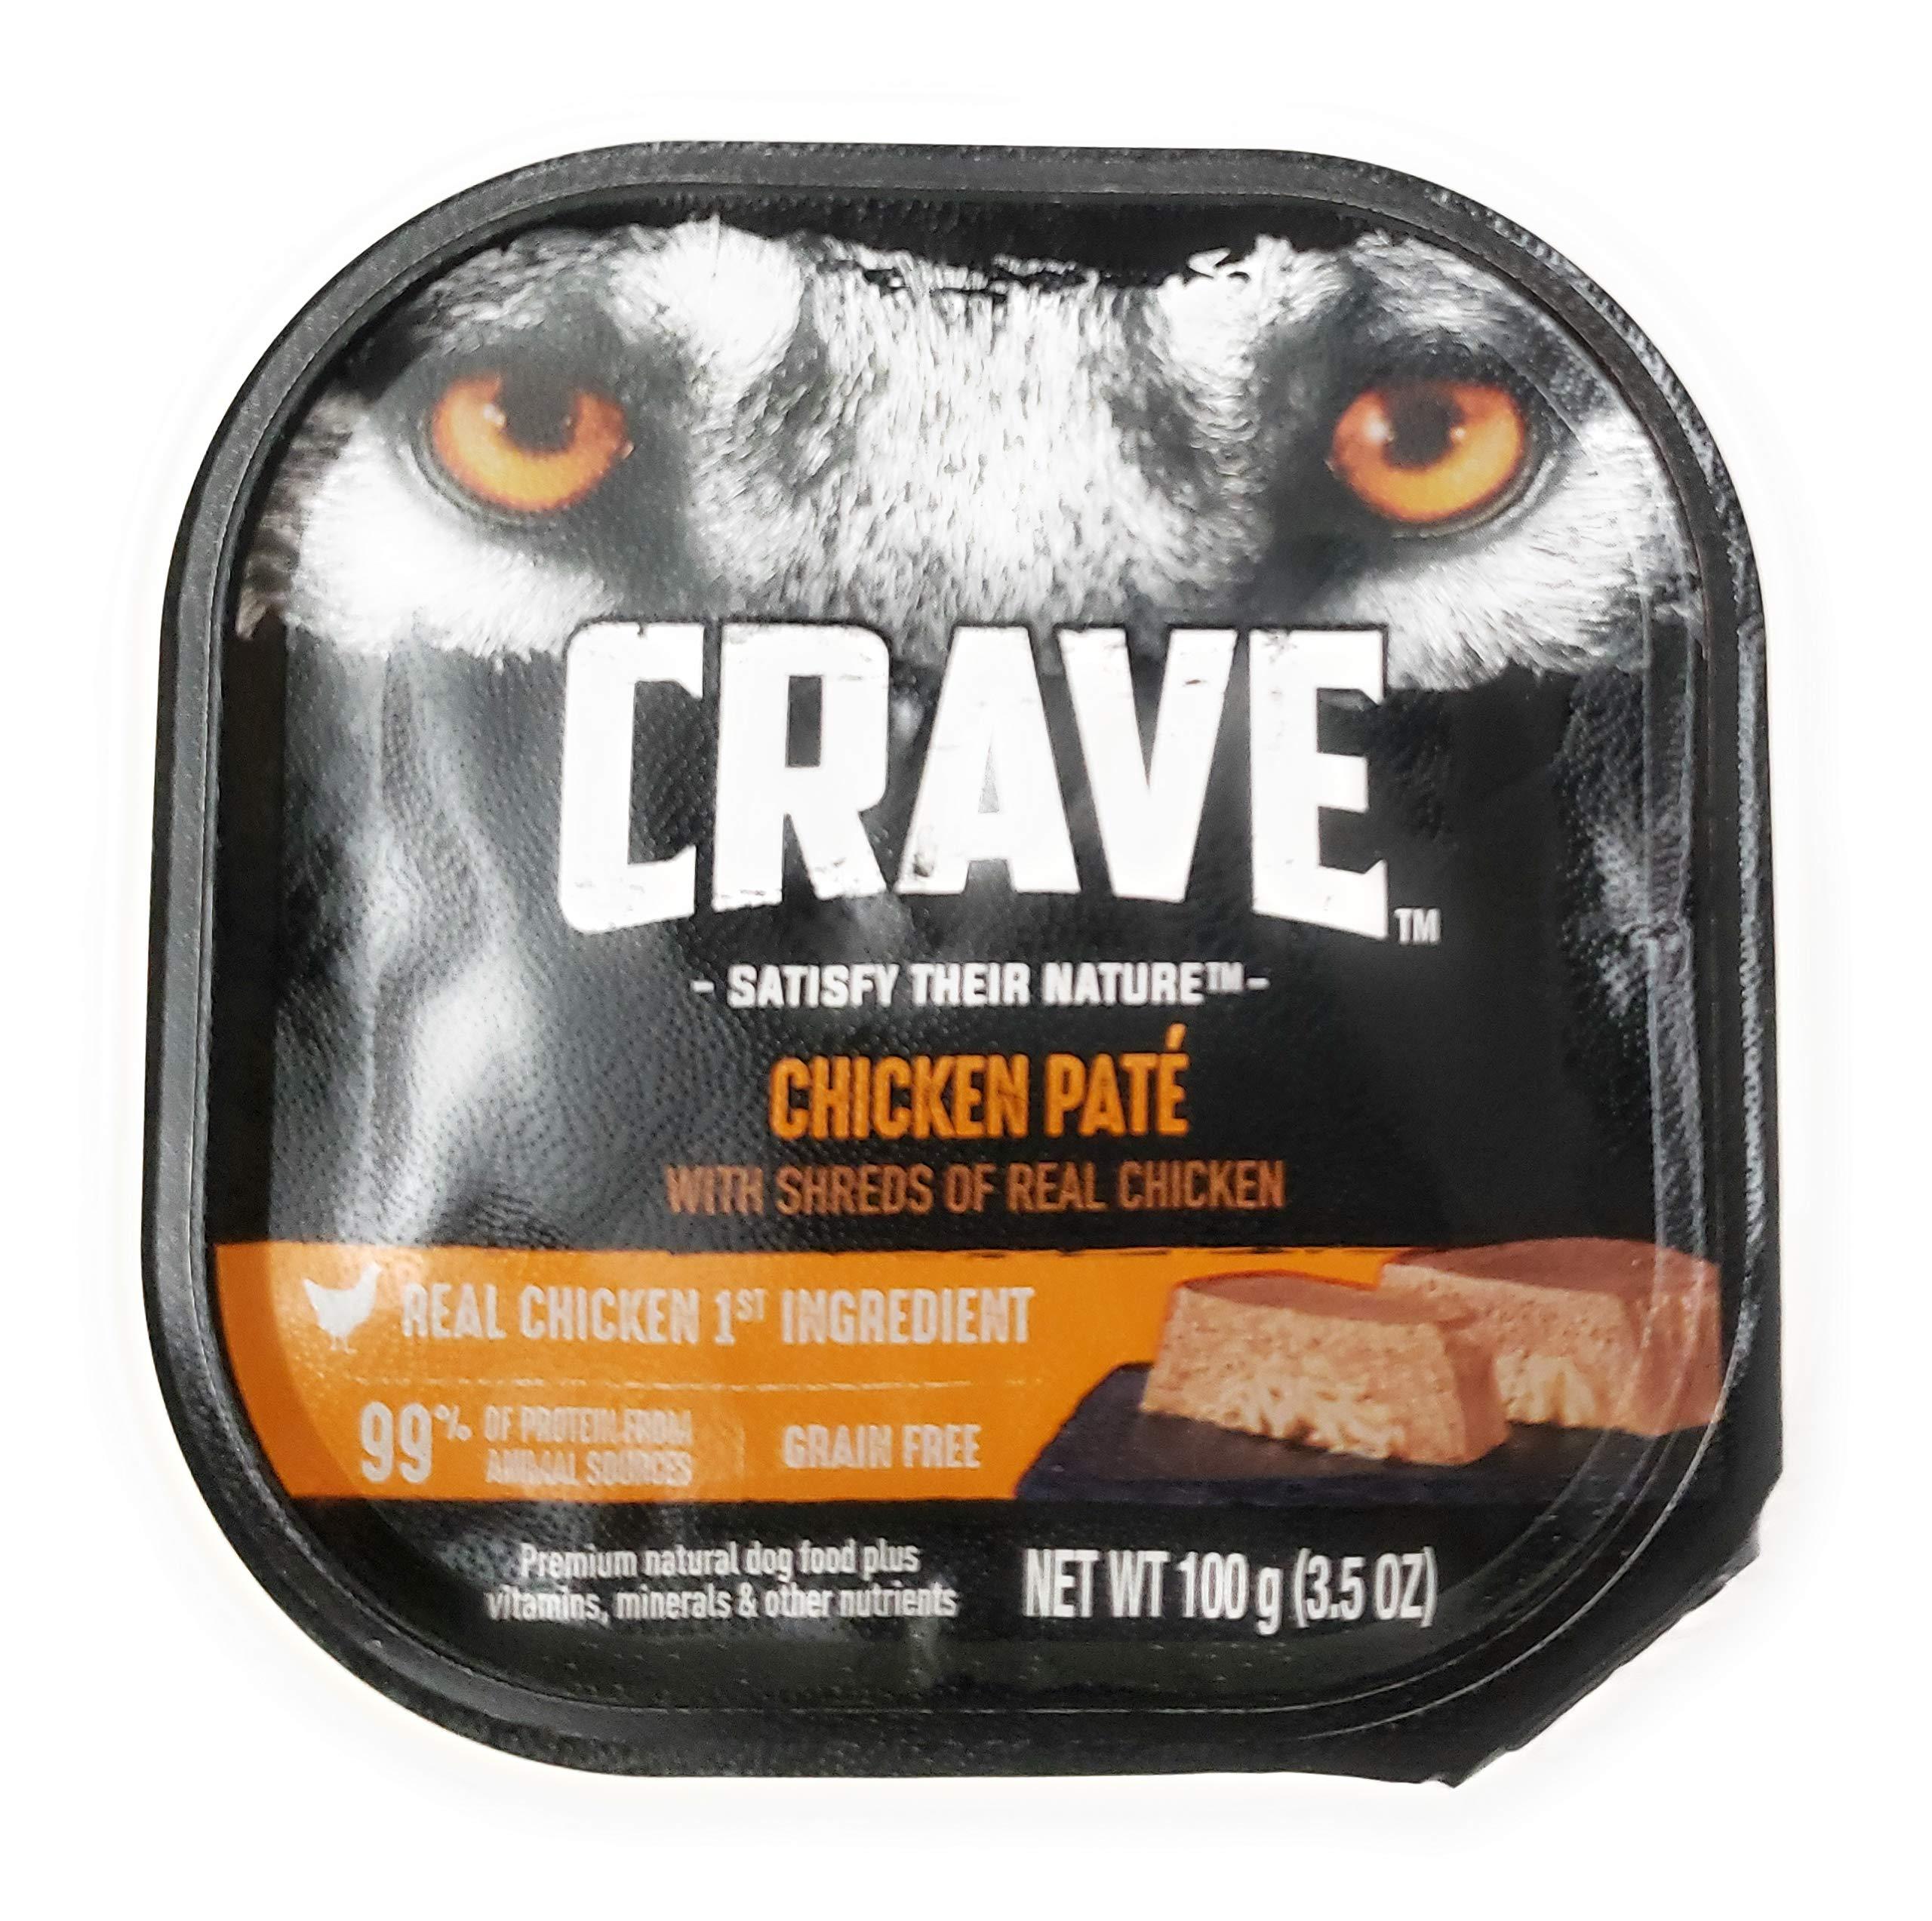 Crave Chicken Pate Wet Food 3.5 oz